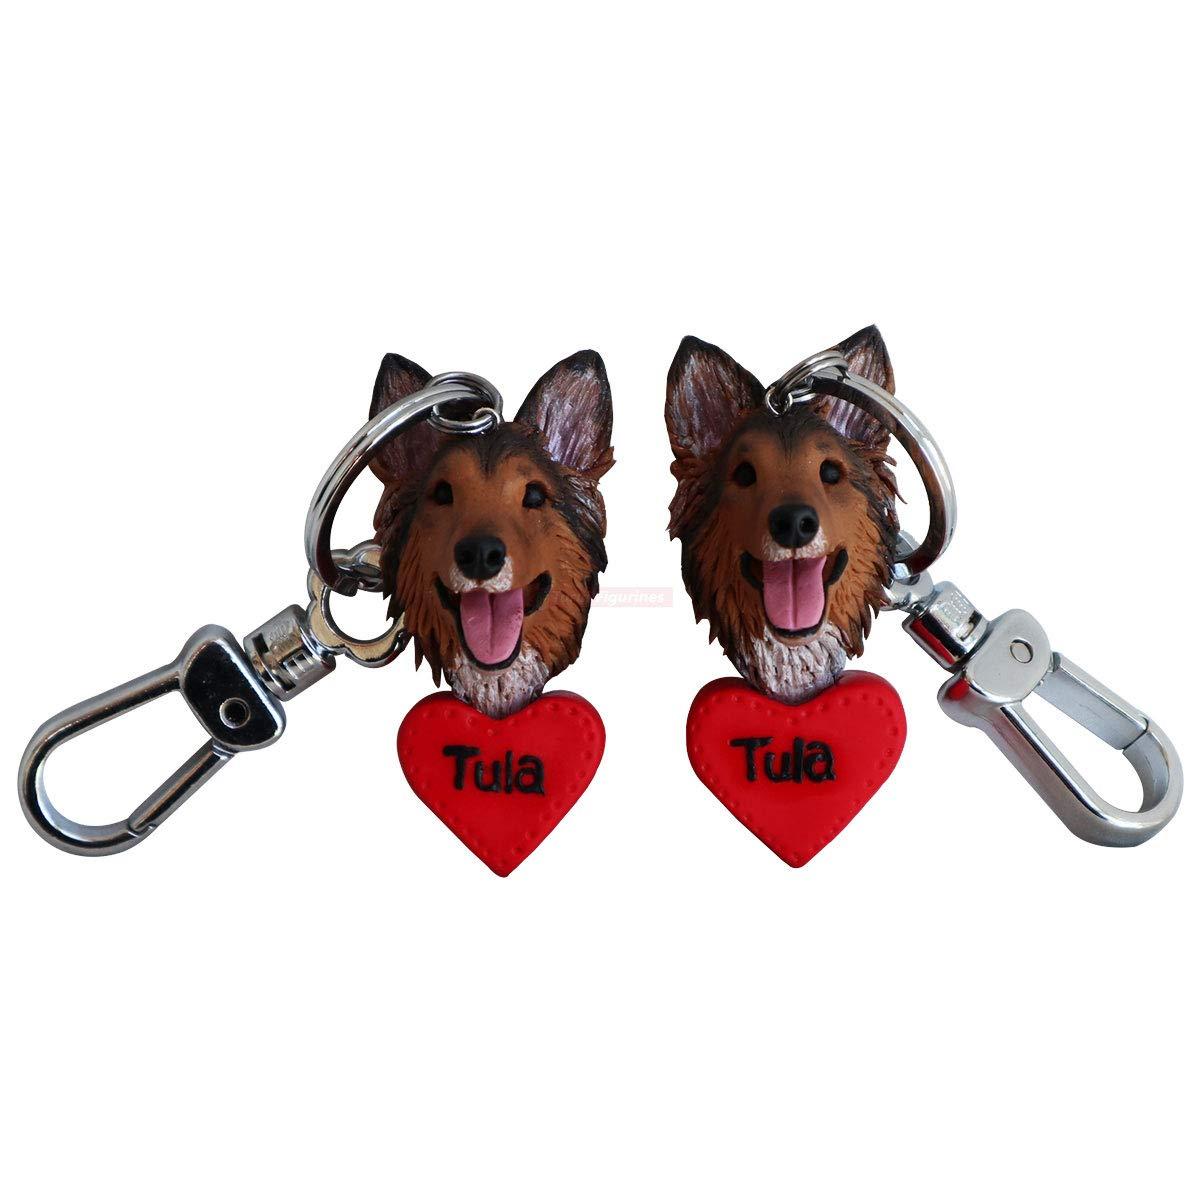 Best Friend Dog Puppy Keyring Key Ring Keychain for Women Men Friendship Christmas Birthday Thanksgiving